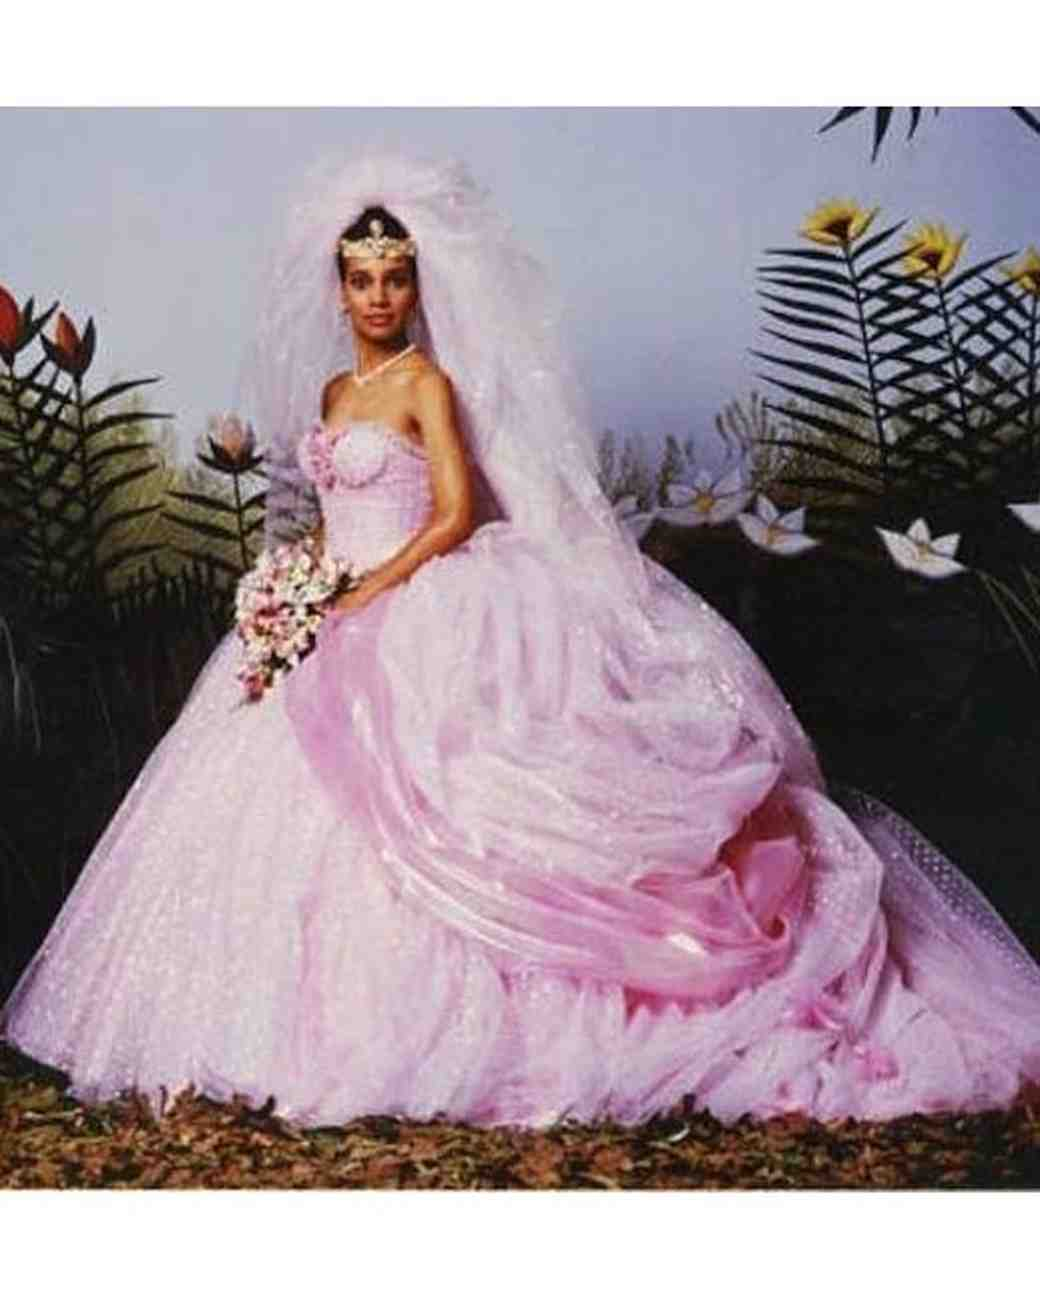 movie-wedding-dresses-coming-to-america-pink-shari-headley-0316.jpg